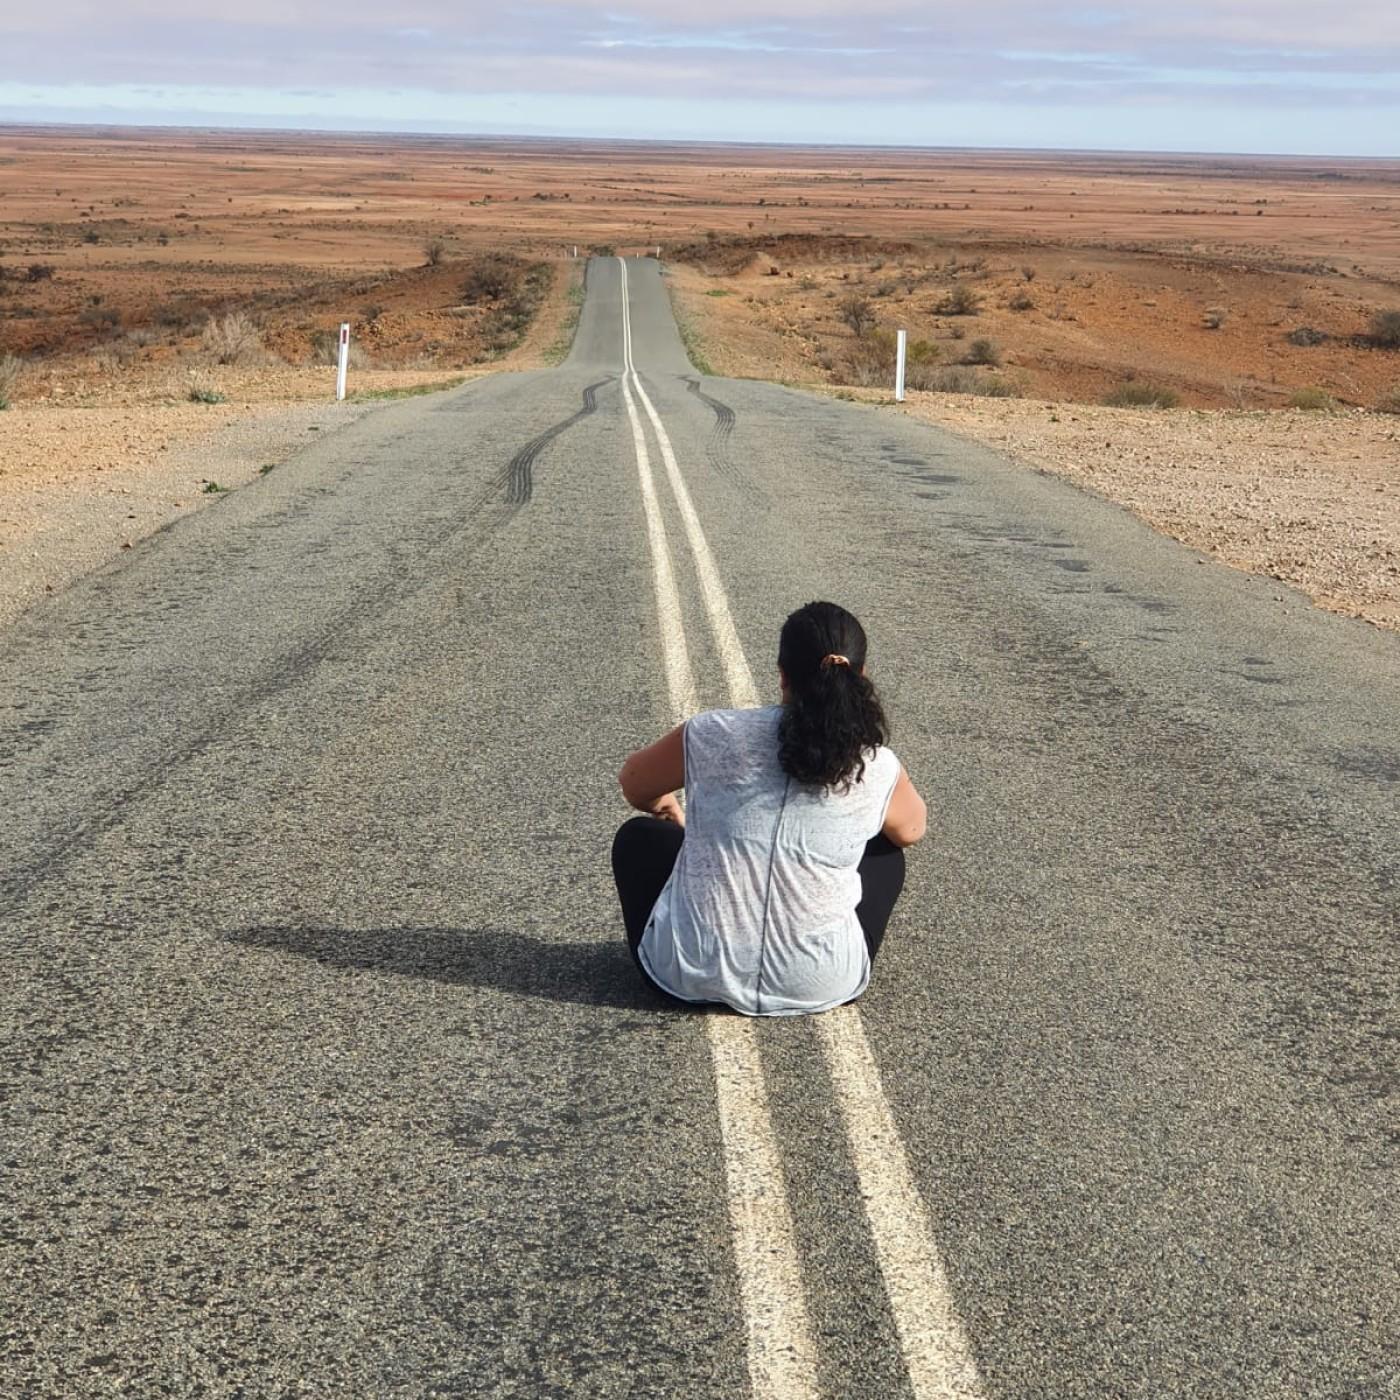 Maitena vit en Australie depuis 15 ans - 11 01 2021 - StereoChic Radio